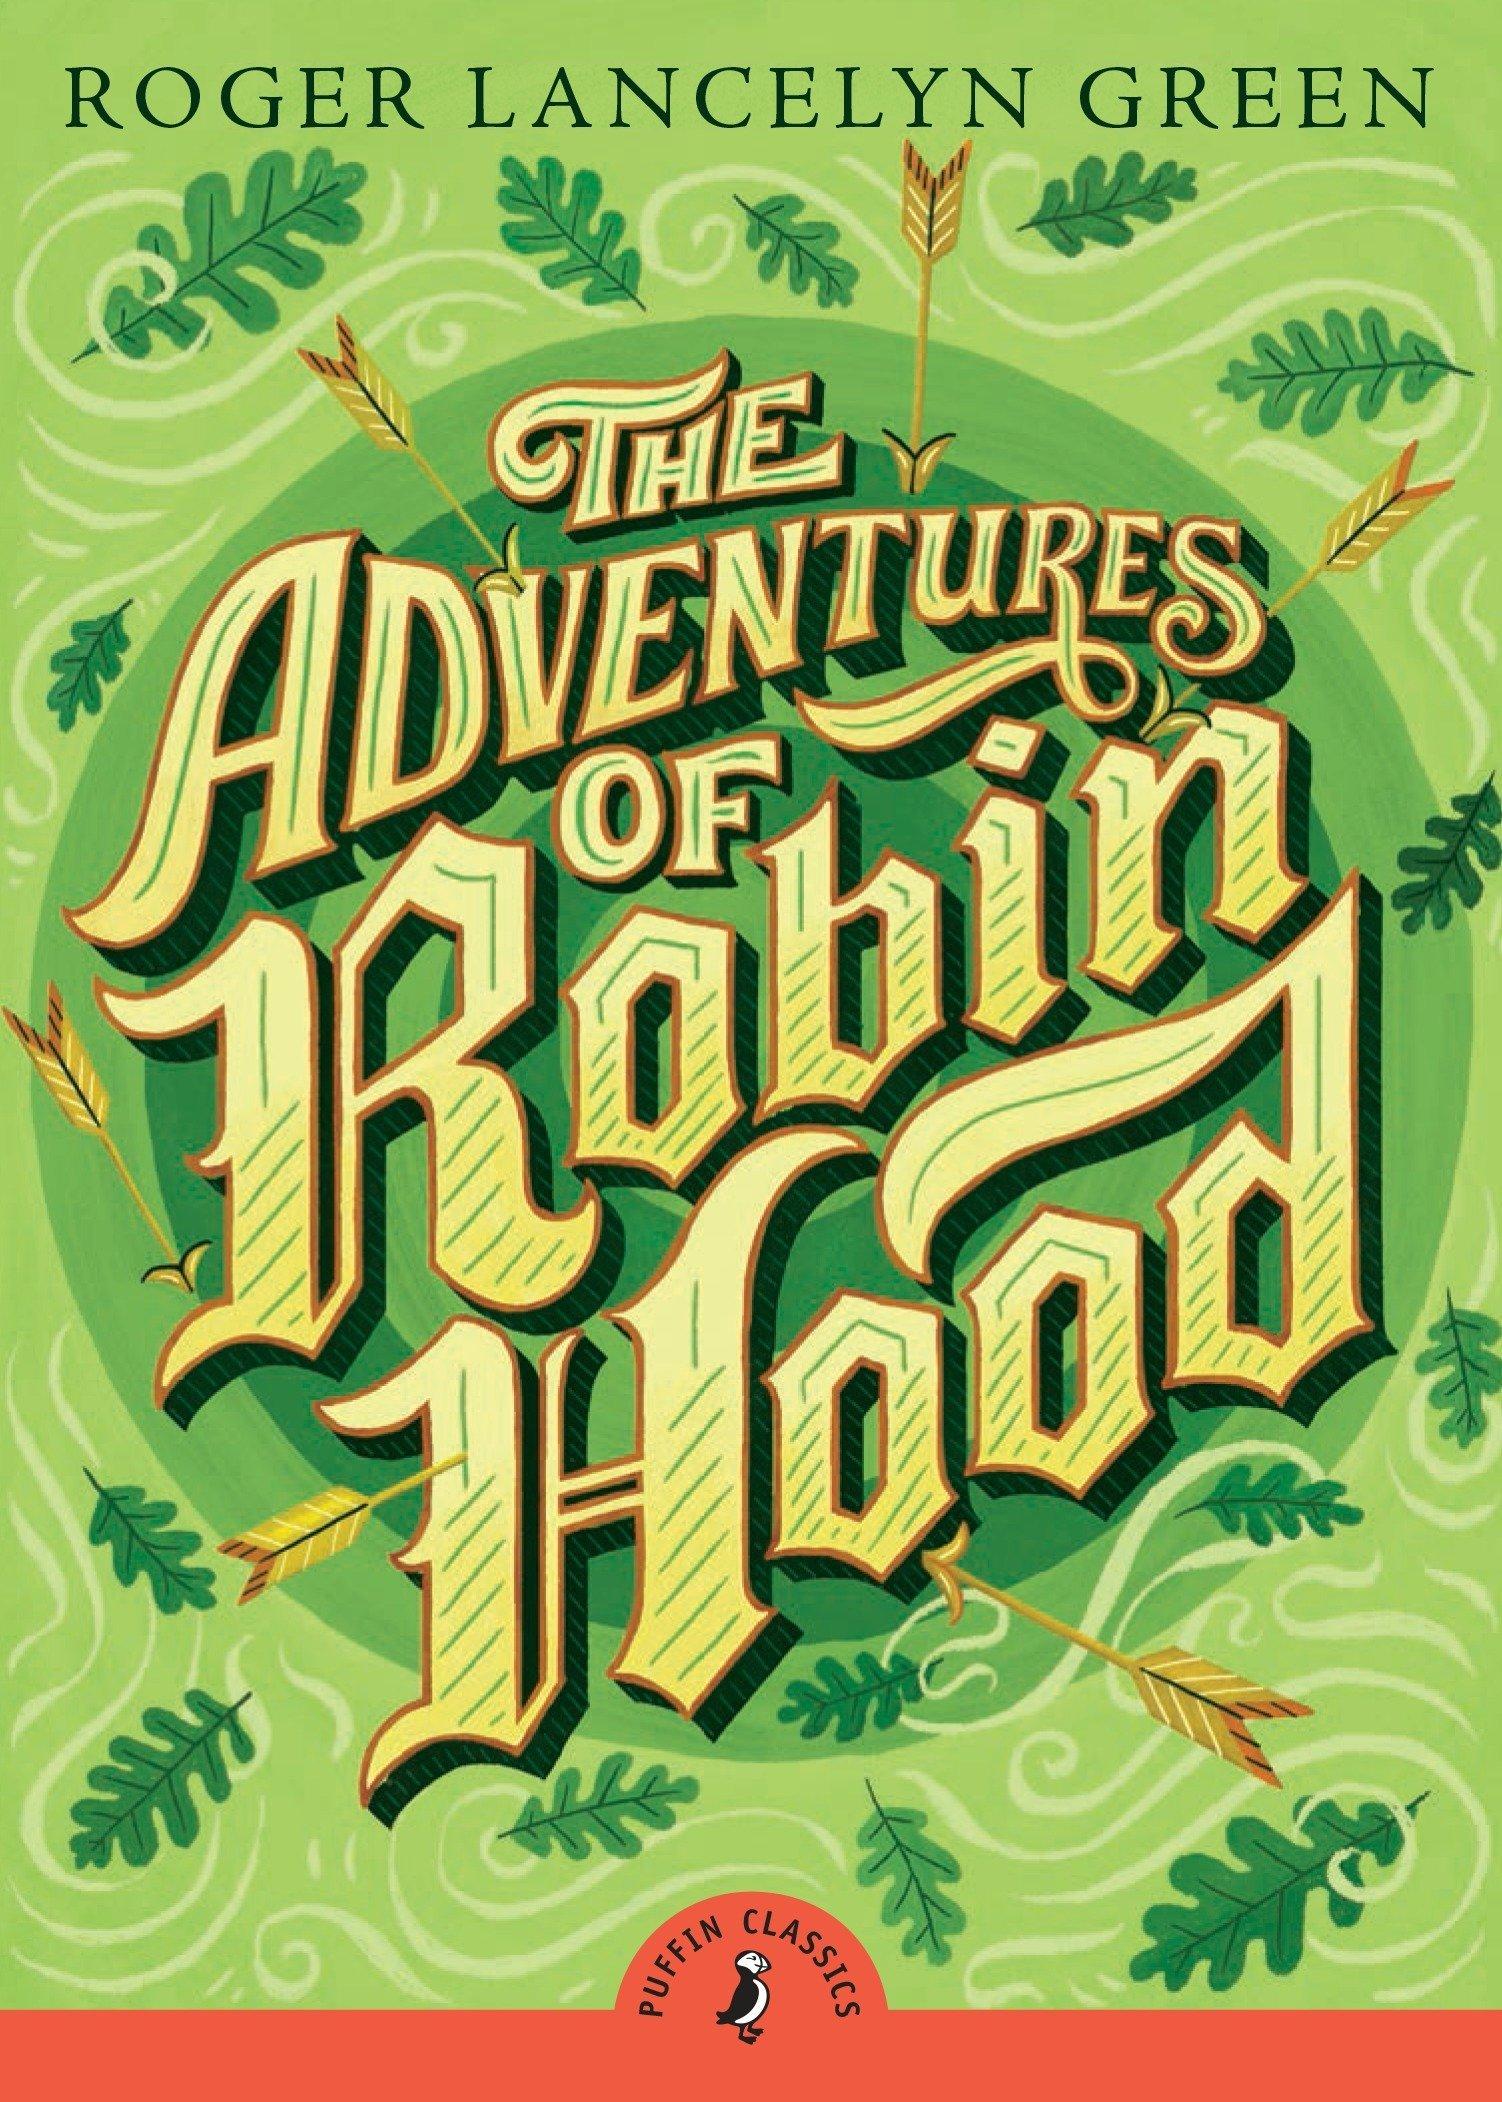 simple robin hood story for kids